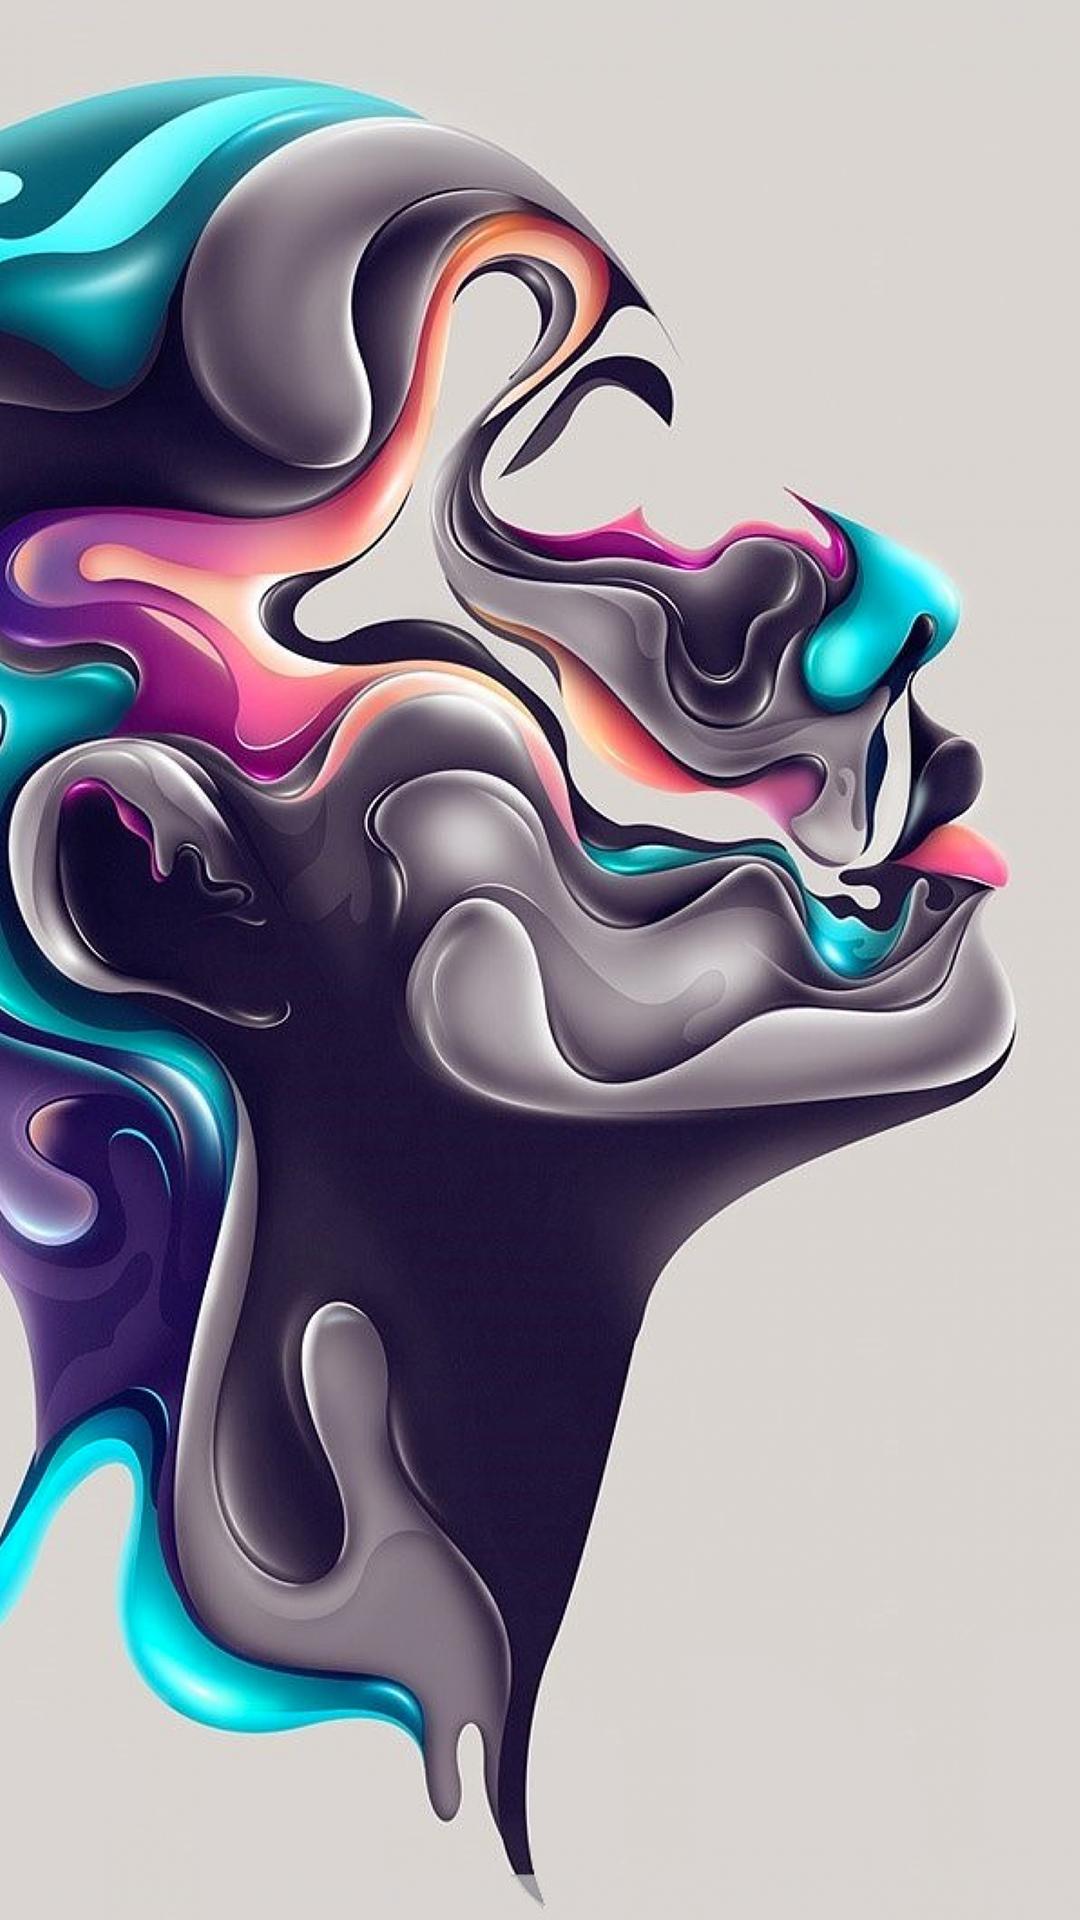 Free Download Abstract Design Steel Portrait Art Iphone 8 Wallpapers Download 1080x1920 For Your Desktop Mobile Tablet Explore 52 Design Iphone Wallpapers 8 Design Iphone Wallpapers 8 Iphone 8 Wallpaper Iphone 8 Wallpapers